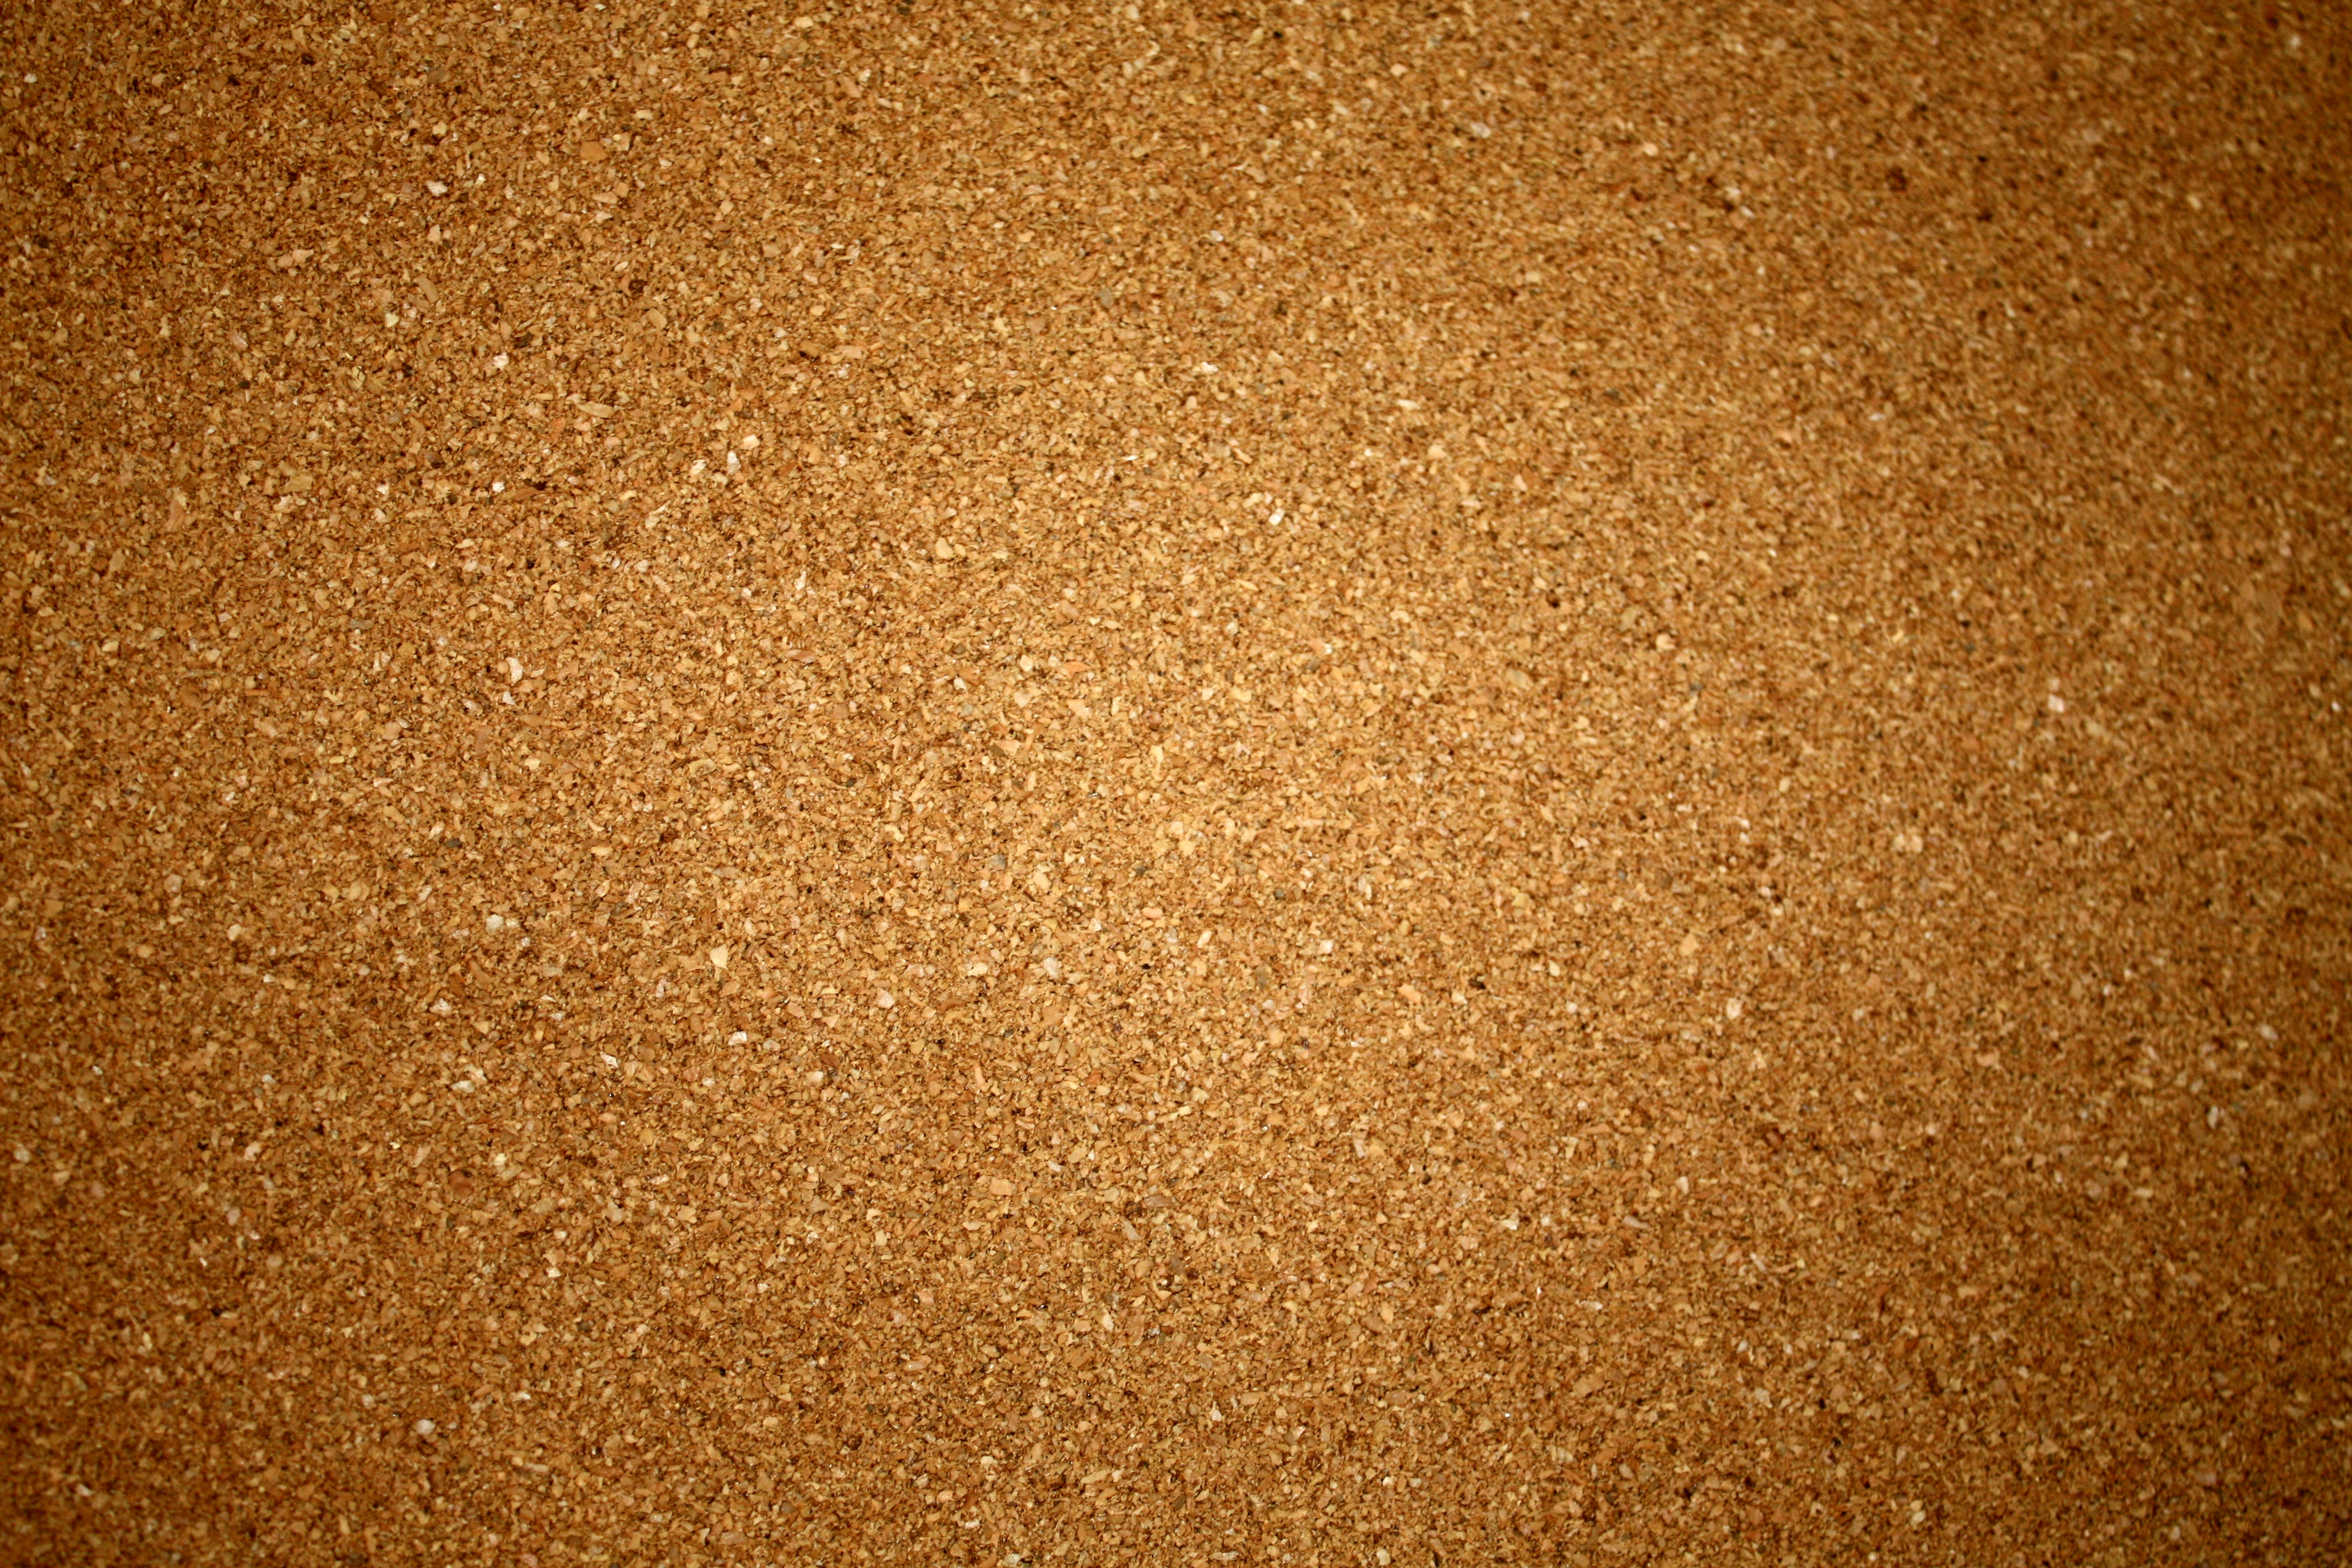 cork board flickr photo sharing